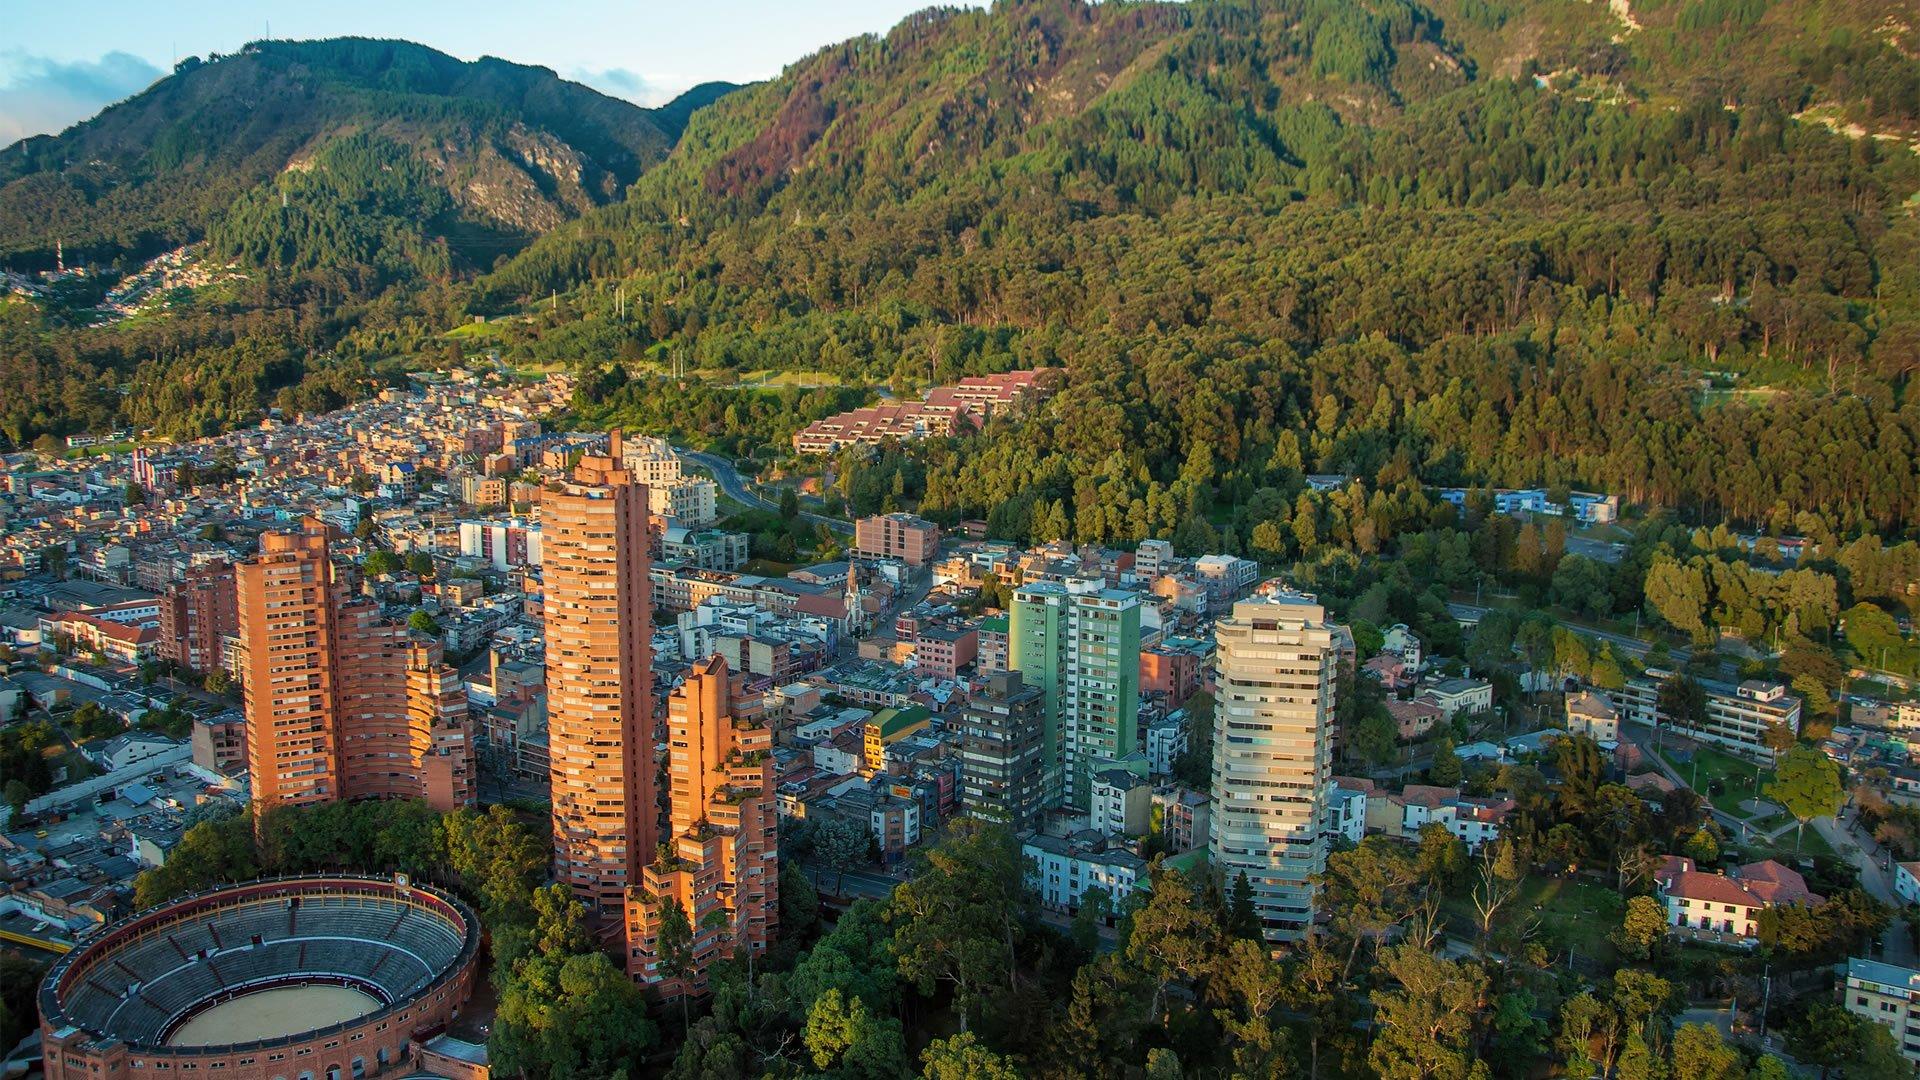 Vista aérea de Bogotá, la capital de Colombia